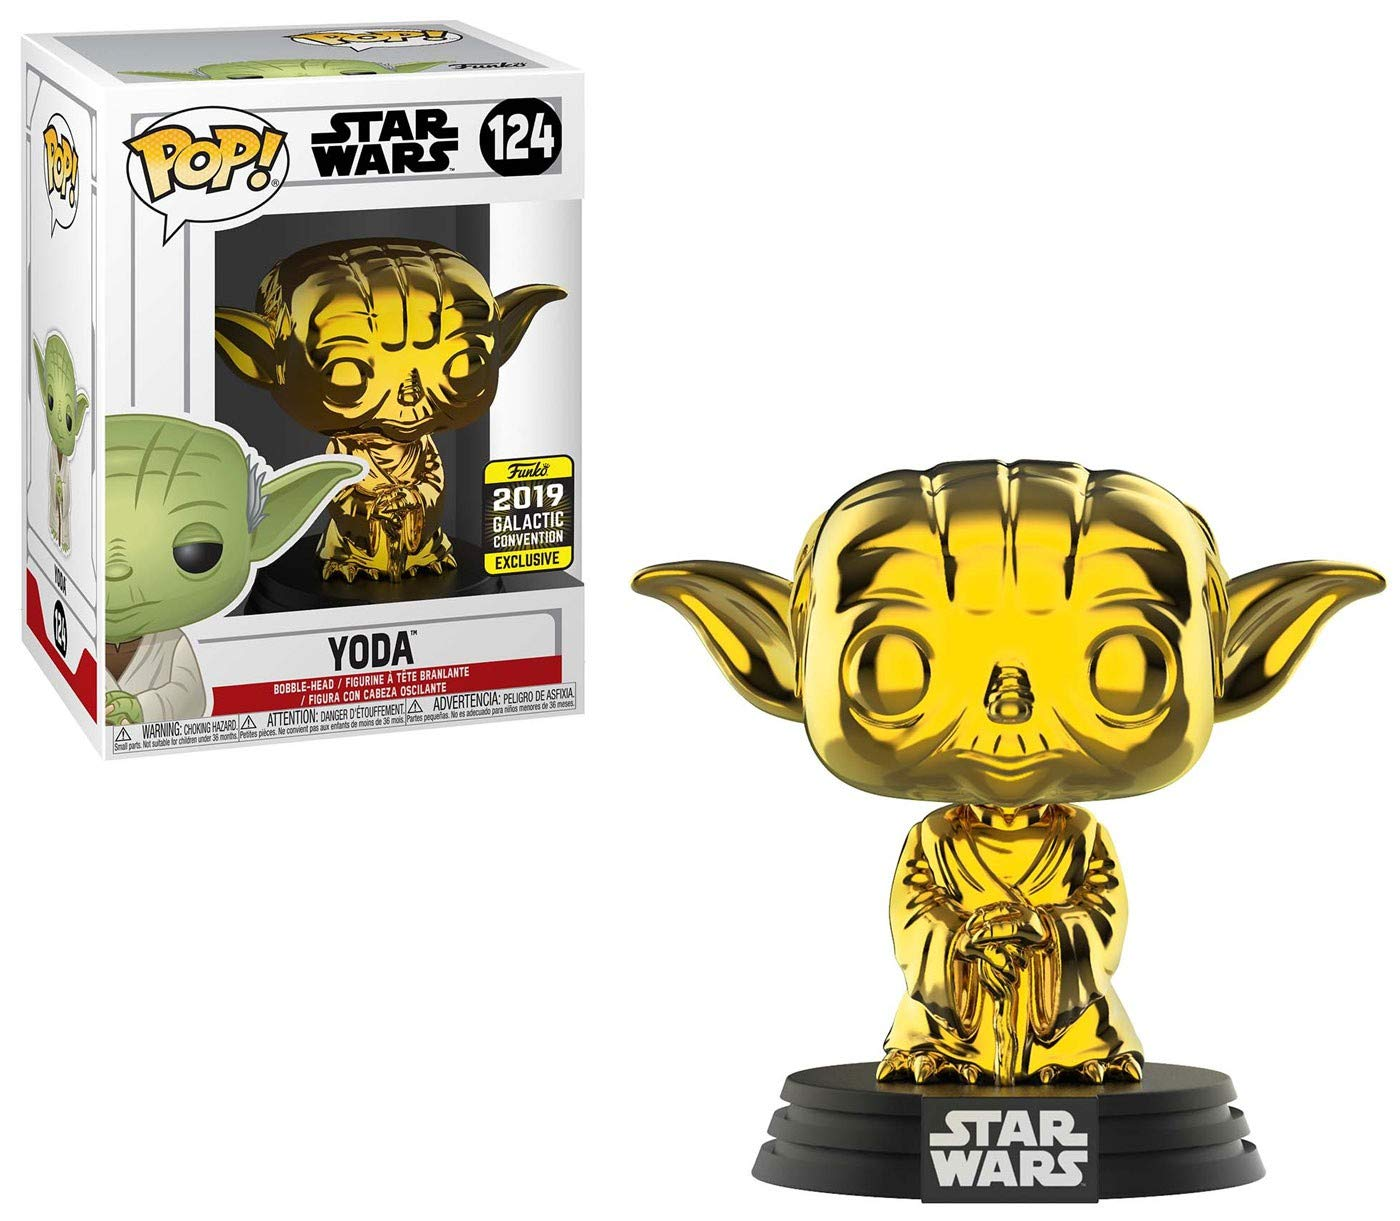 2019 Galactic Convention Star Wars Chrome Boba Fett Funko